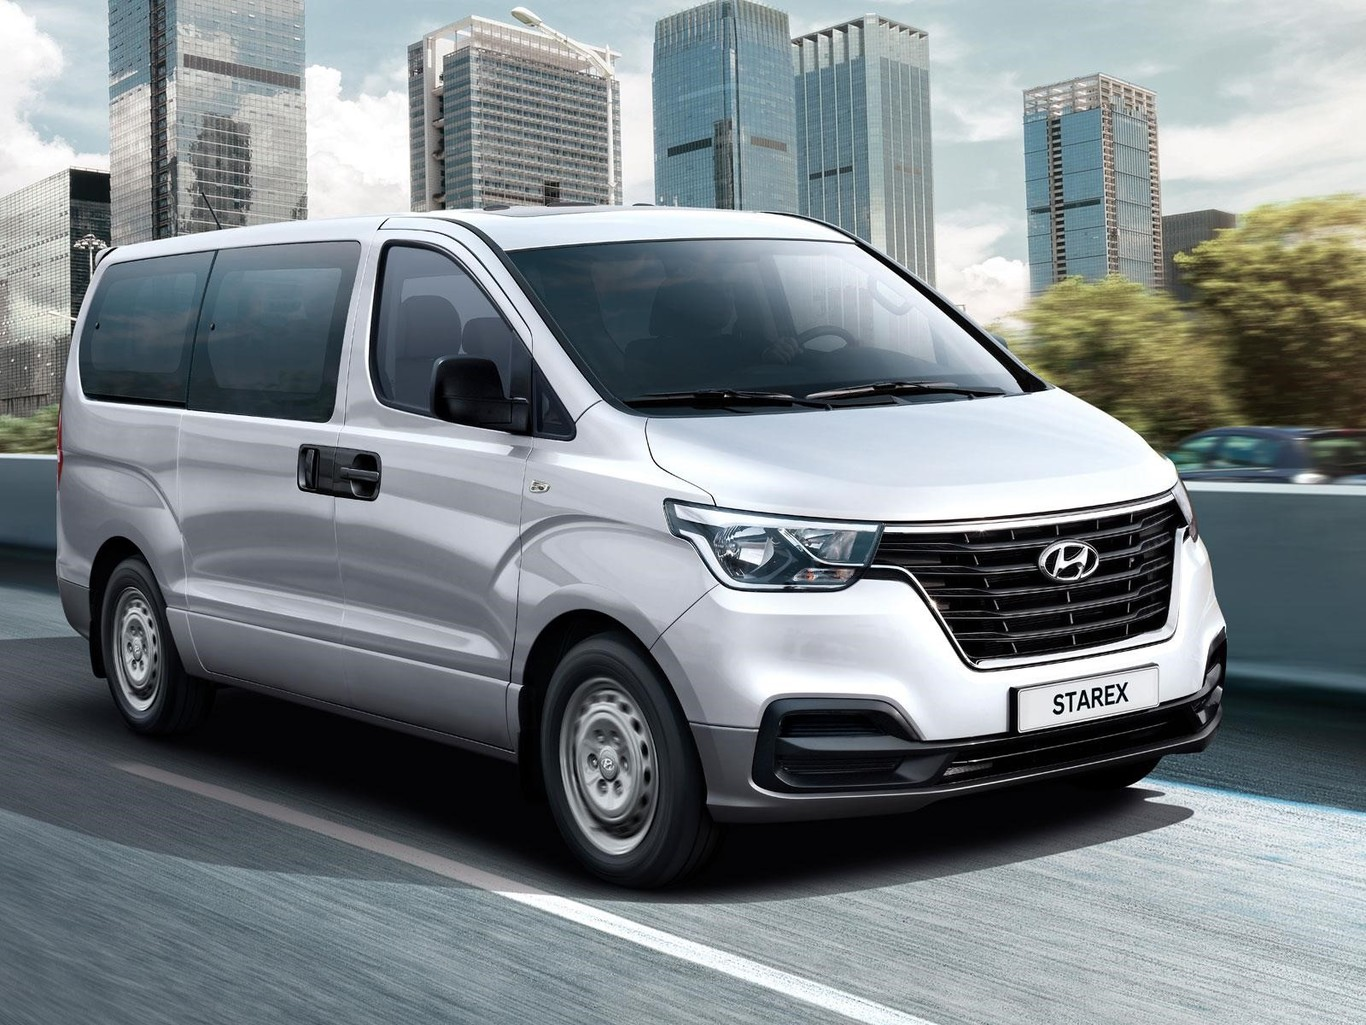 2020 Hyundai Starex Redesign and Concept